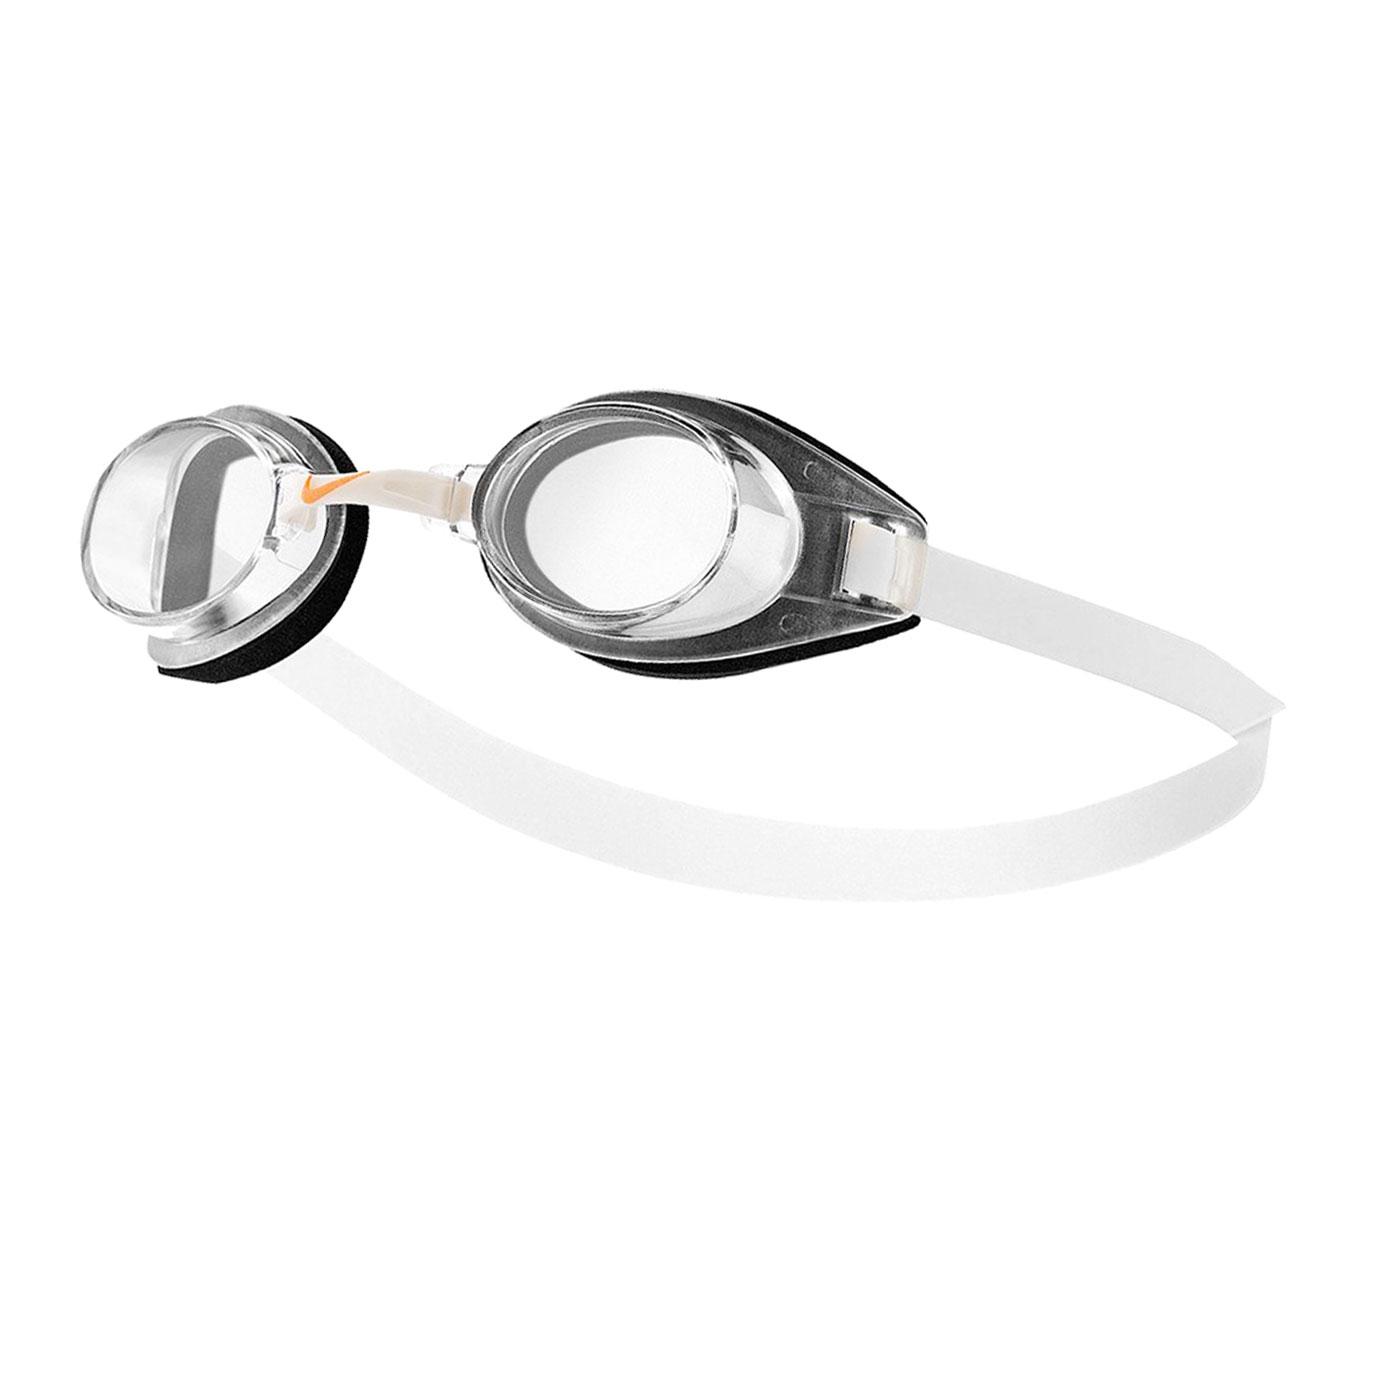 NIKE SWIM 休閒型成人泳鏡 TFSS0555-000